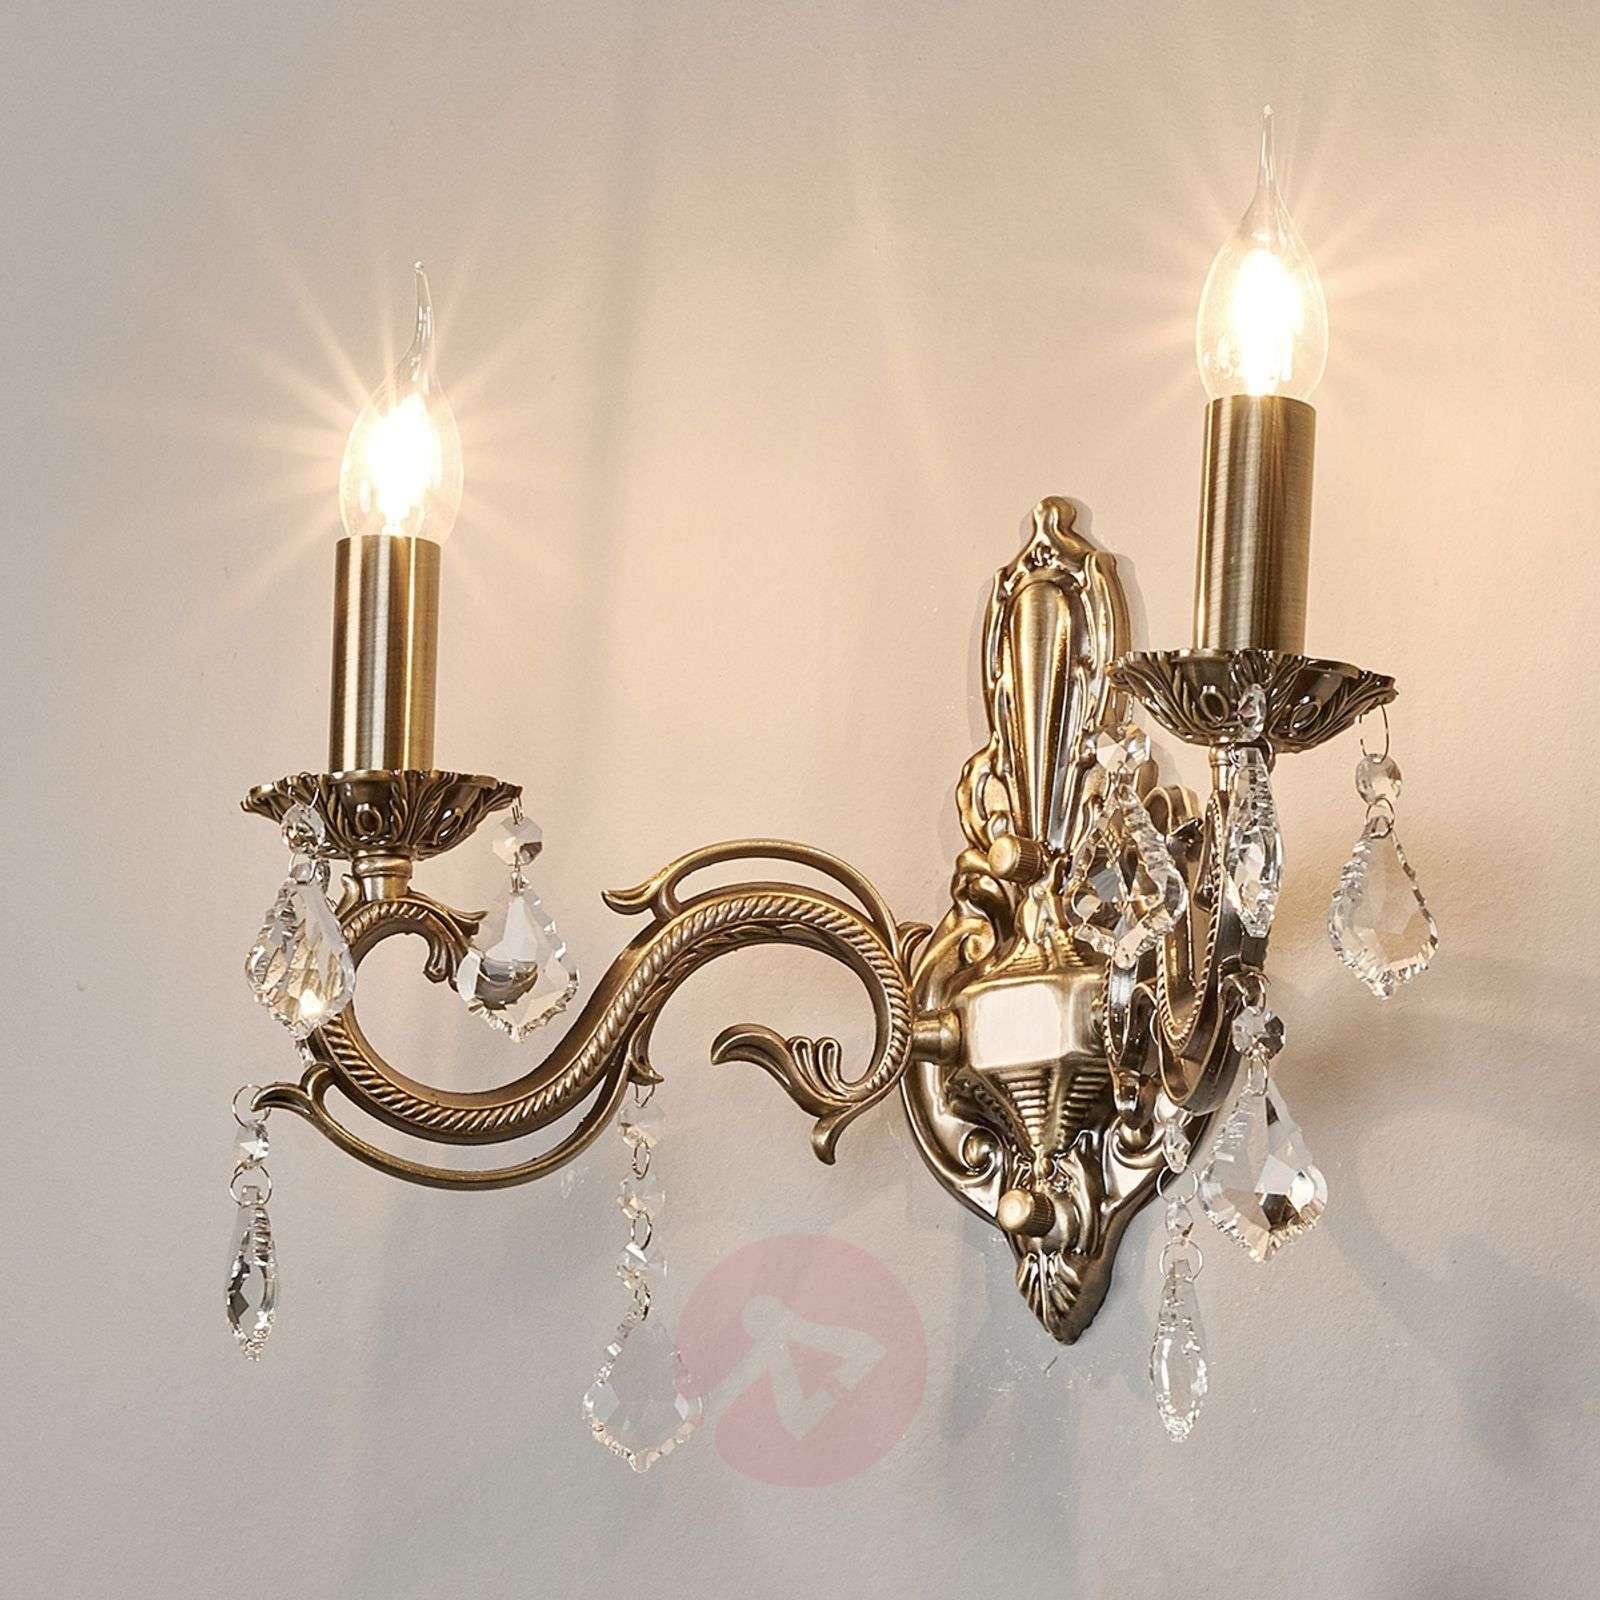 Bronze Kora wall light, with two bulbs-9973008-01